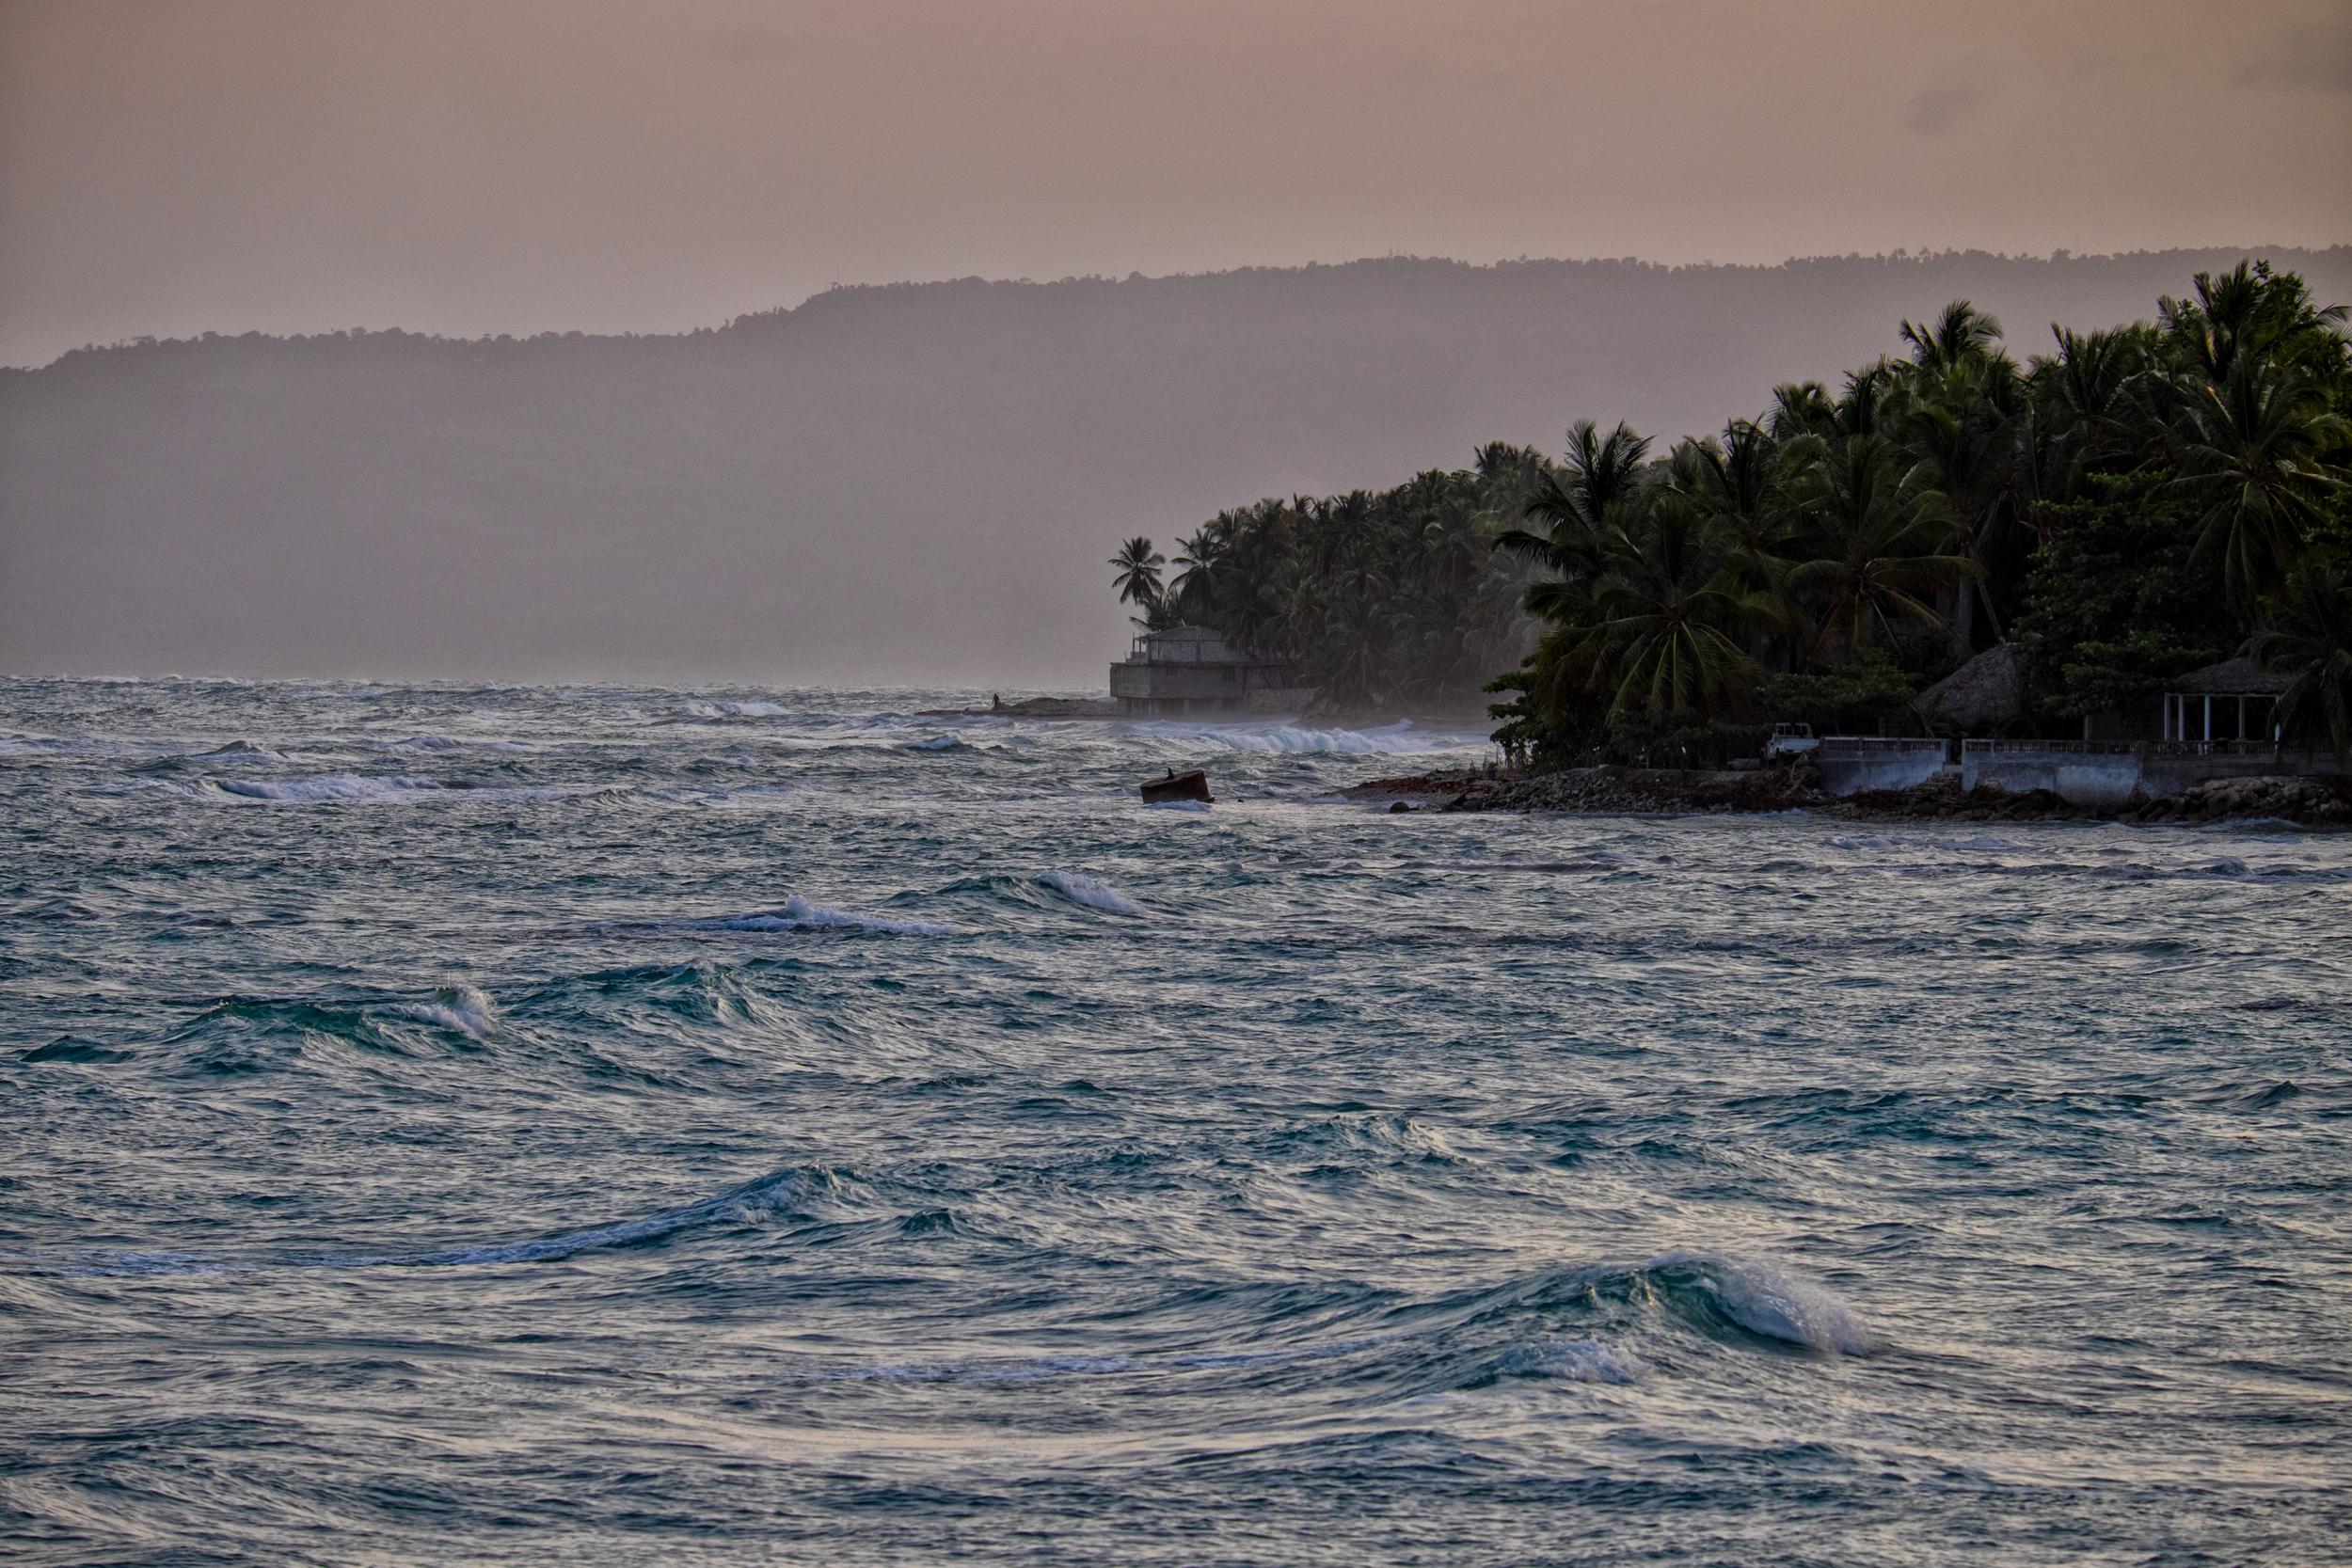 Haiti's southern coast. 200mm at f/7.1 on the X-T1